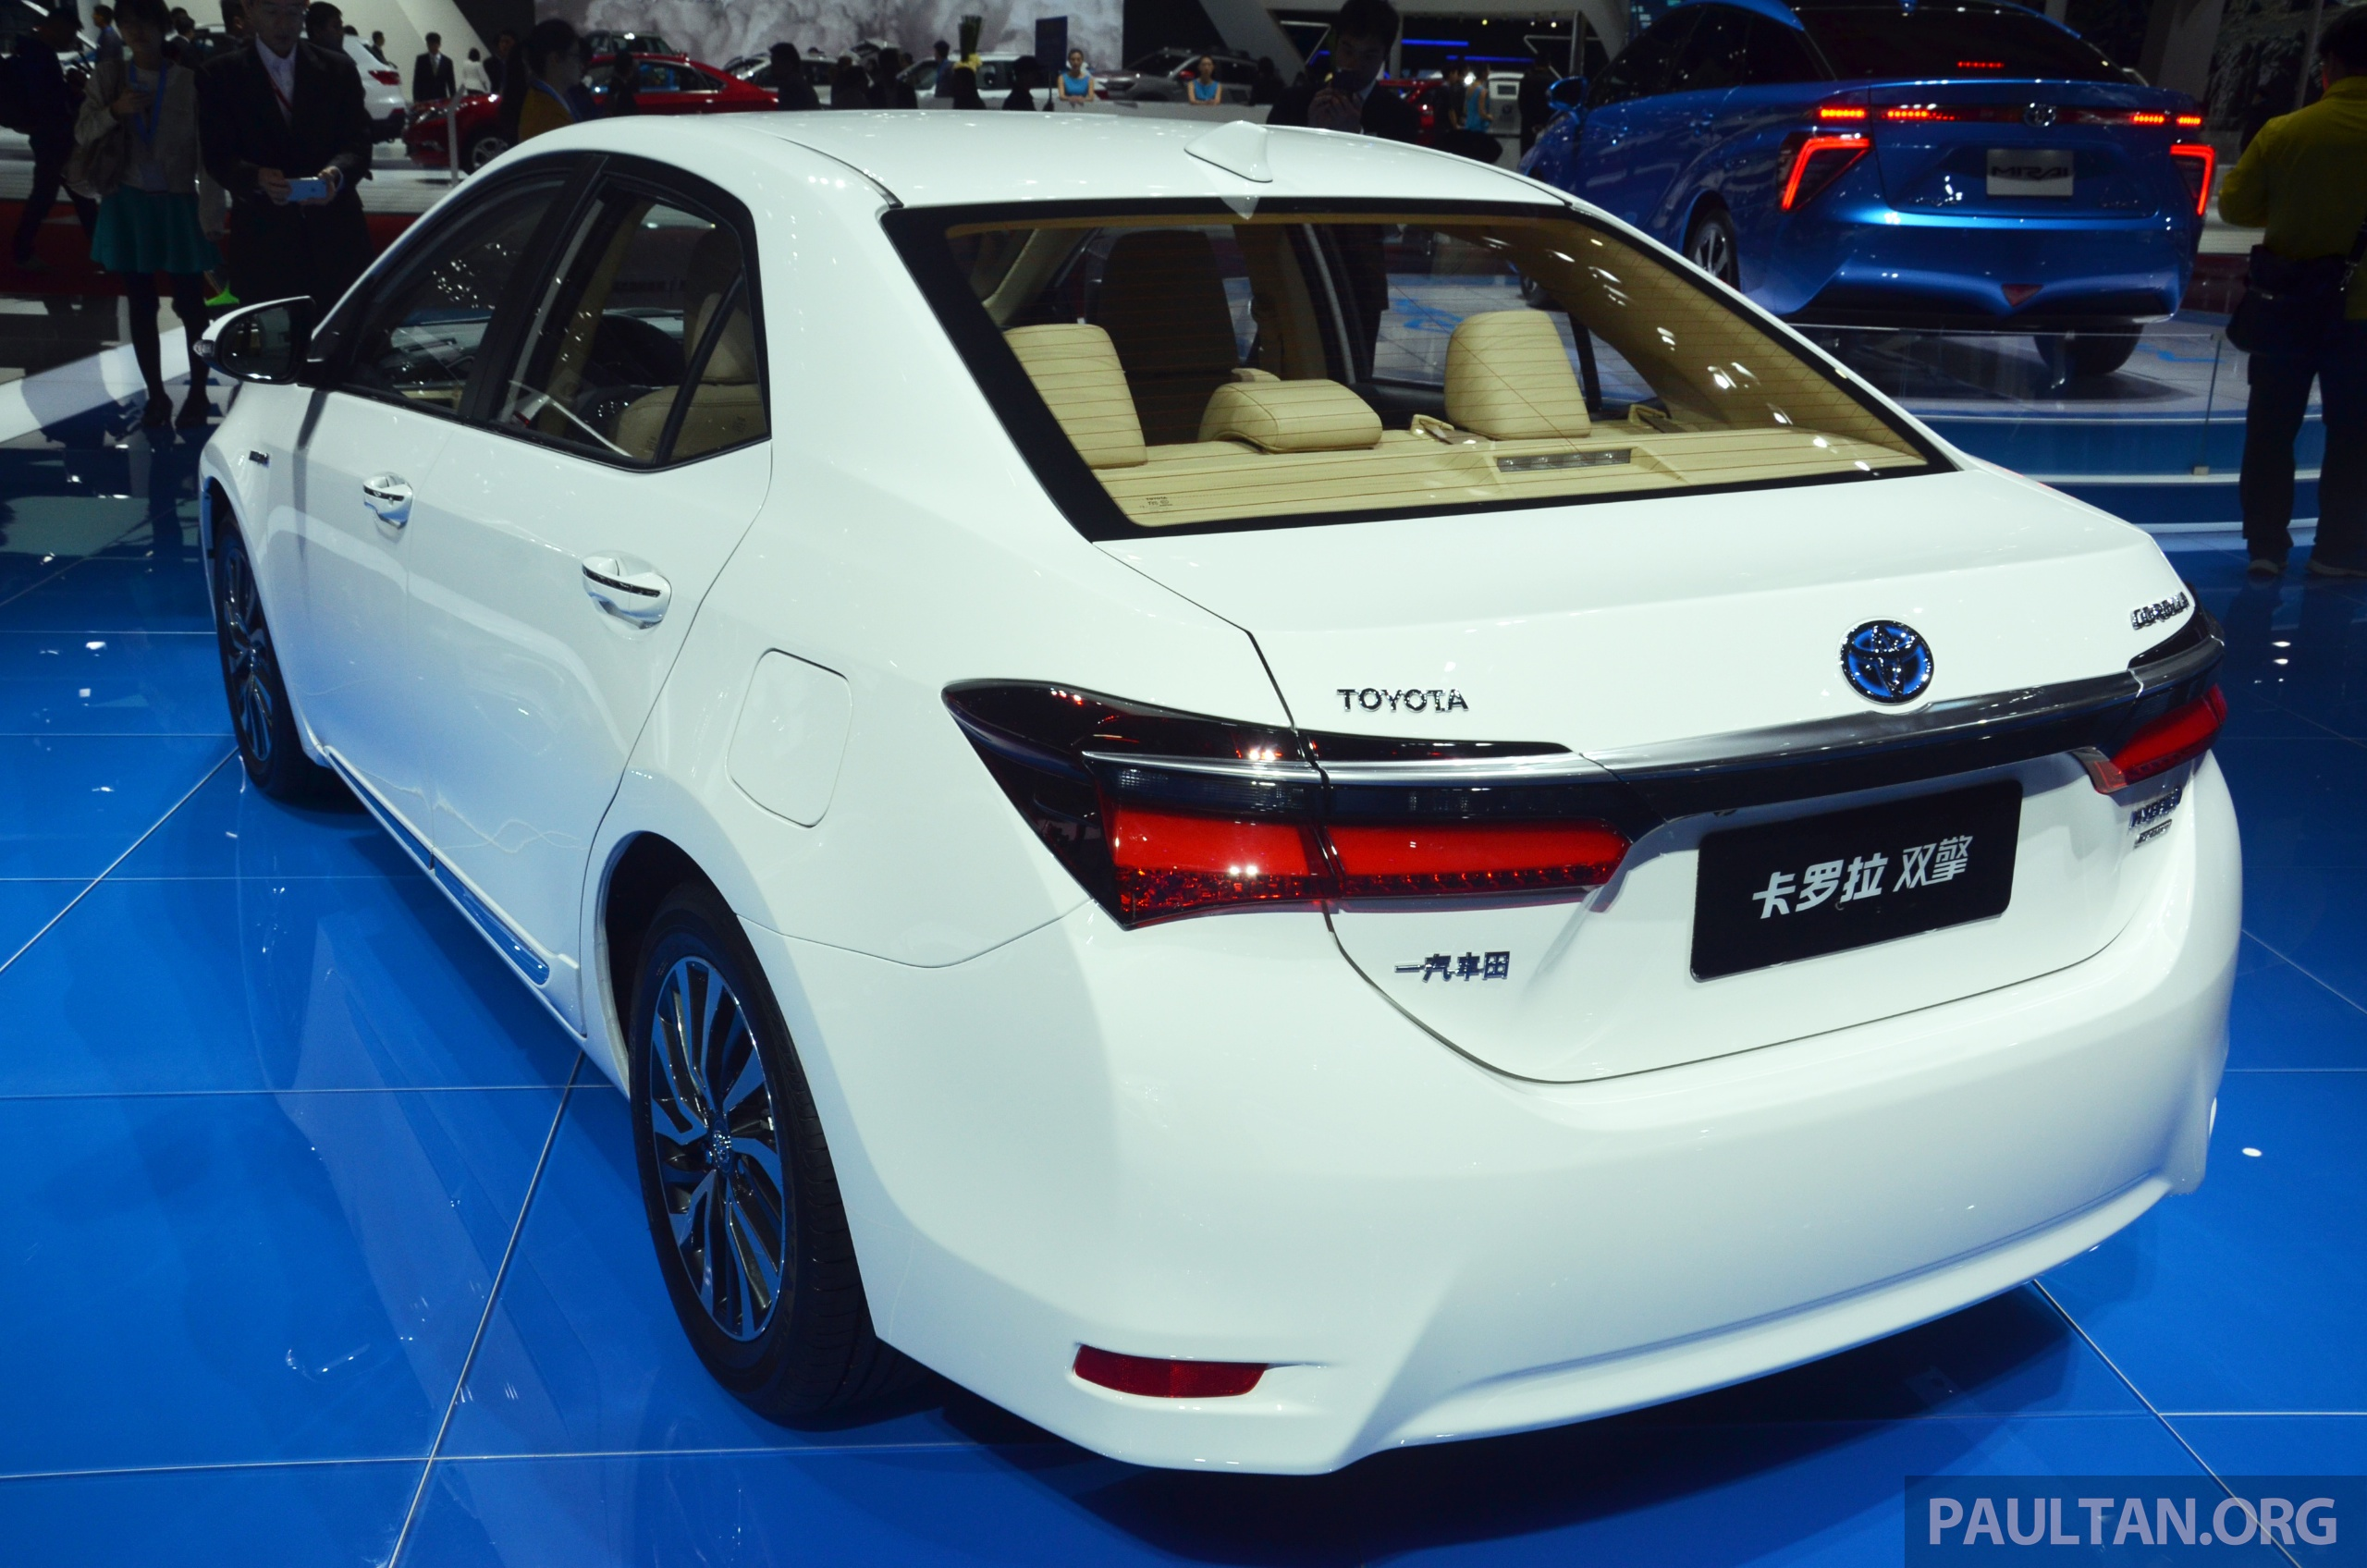 Shanghai 2015: Toyota Corolla Hybrid/Levin HEV debut Image